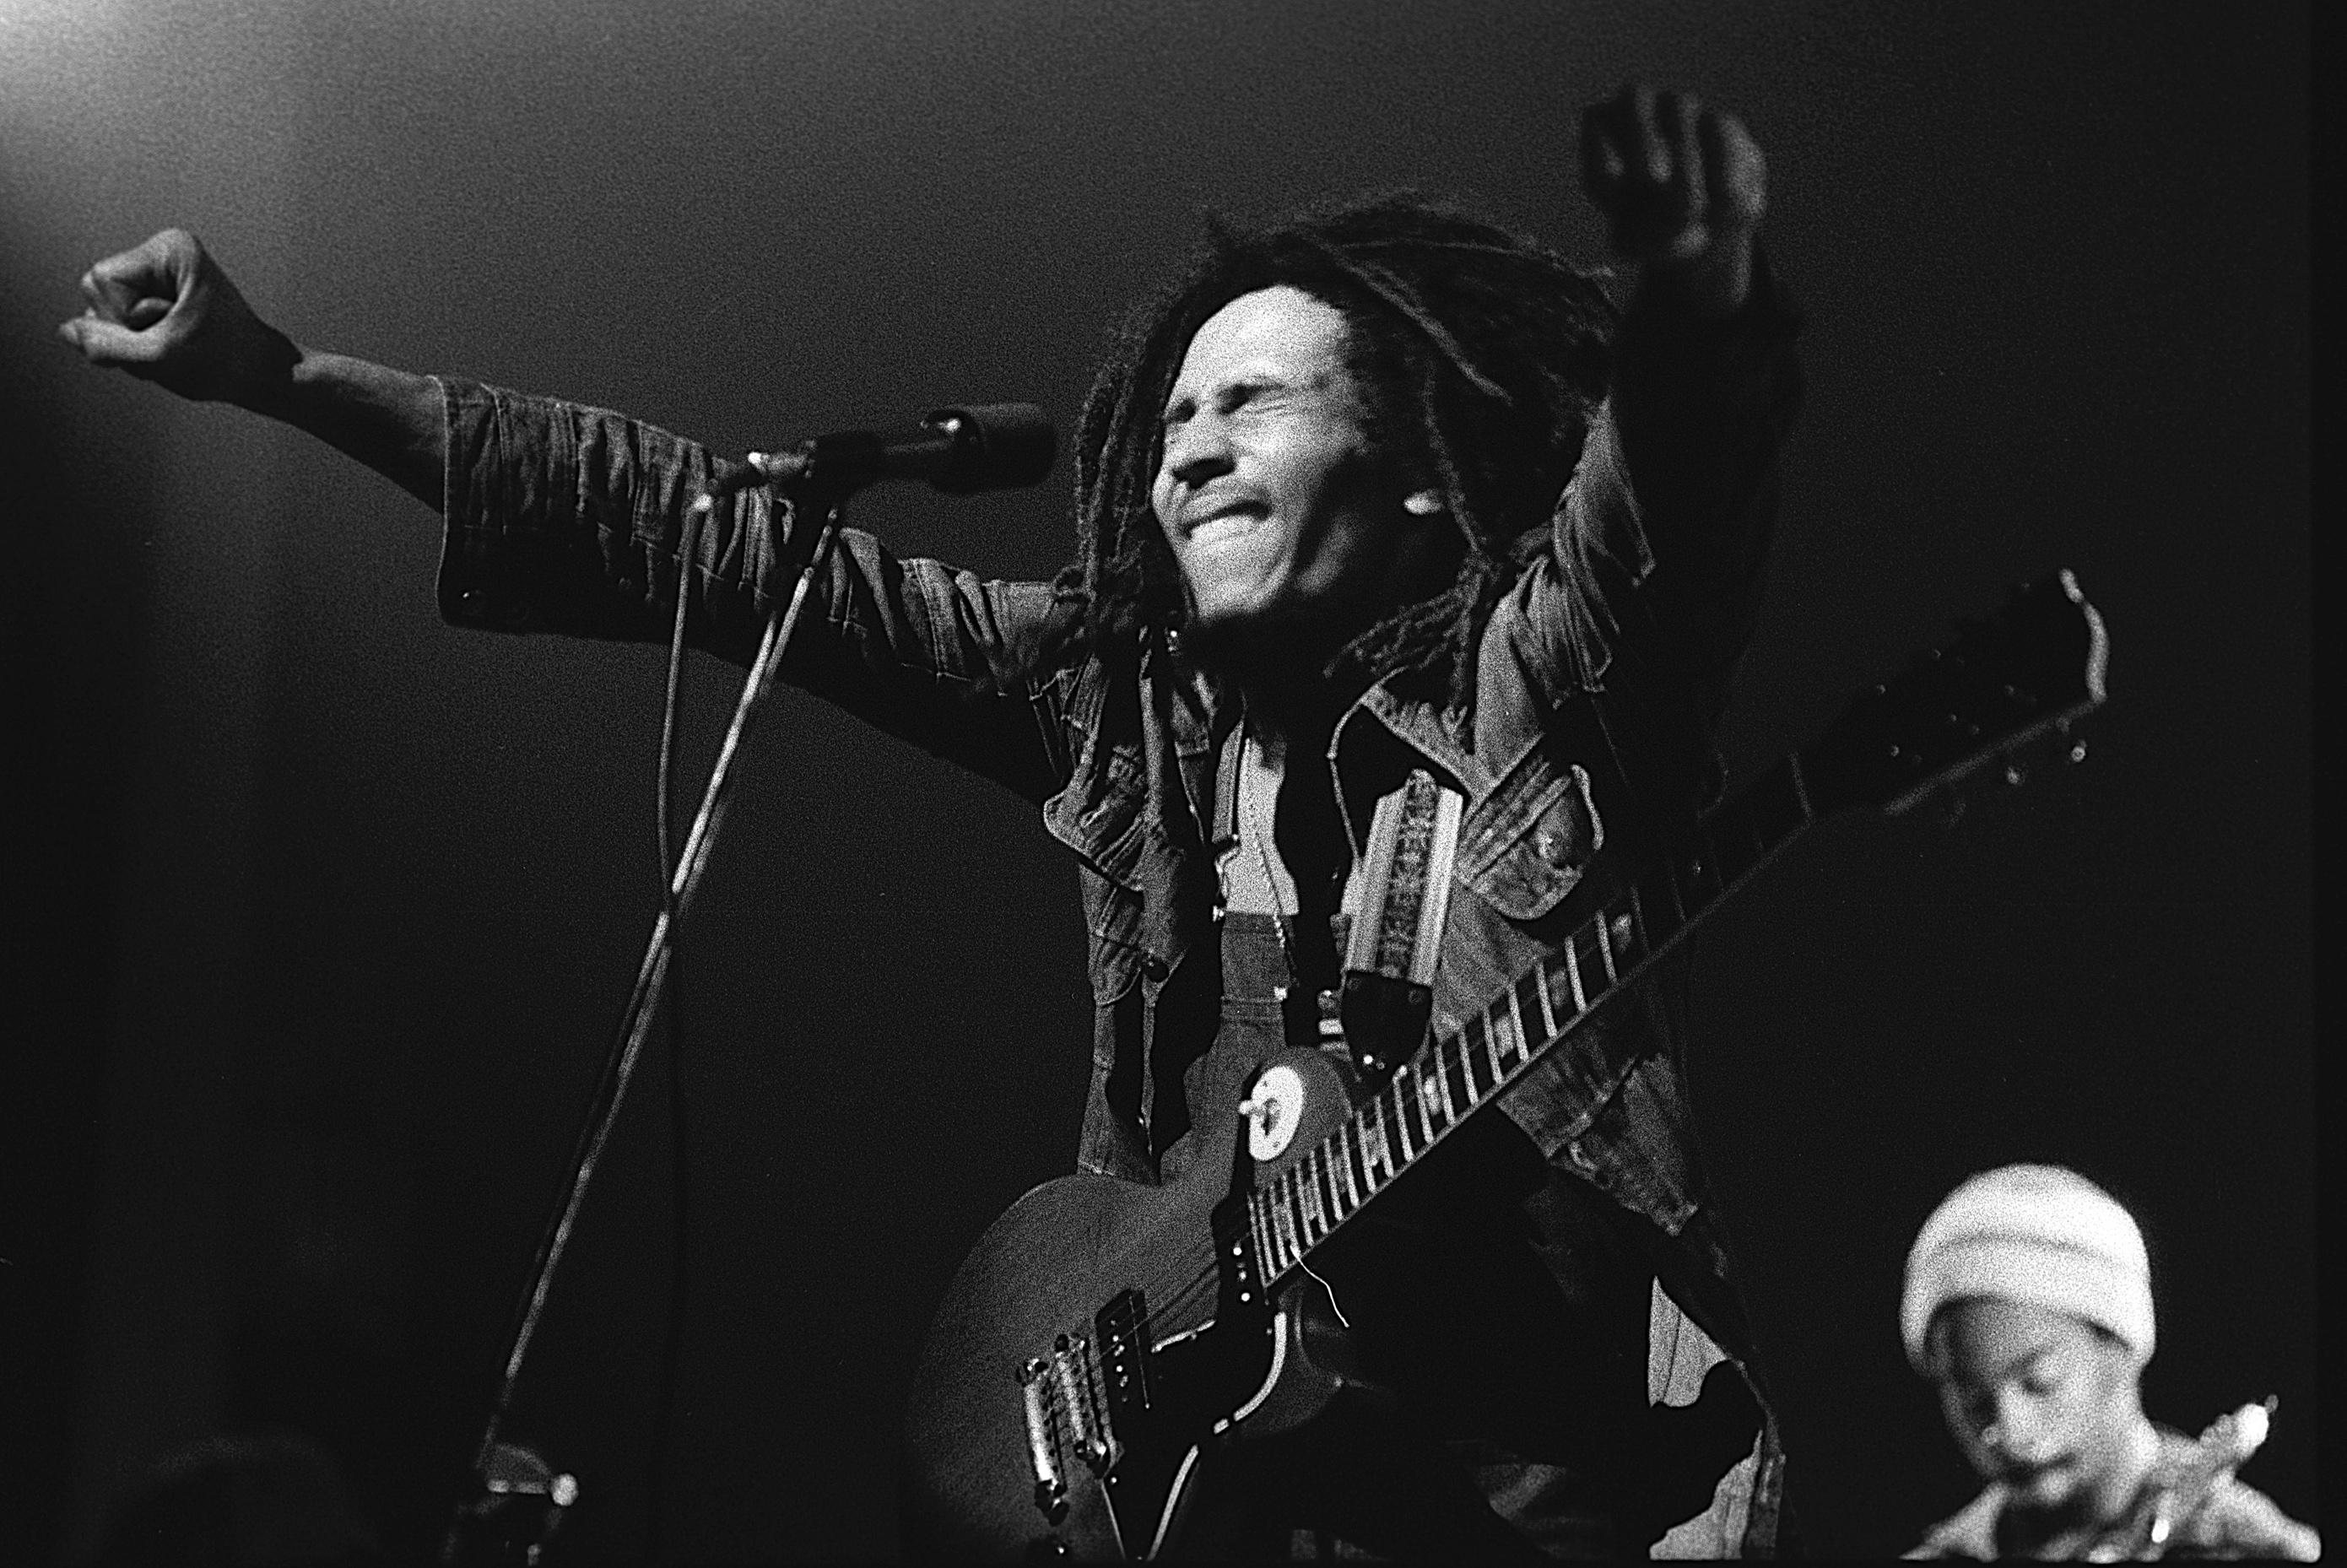 Bob Marley Wallpaper Black And White 246834